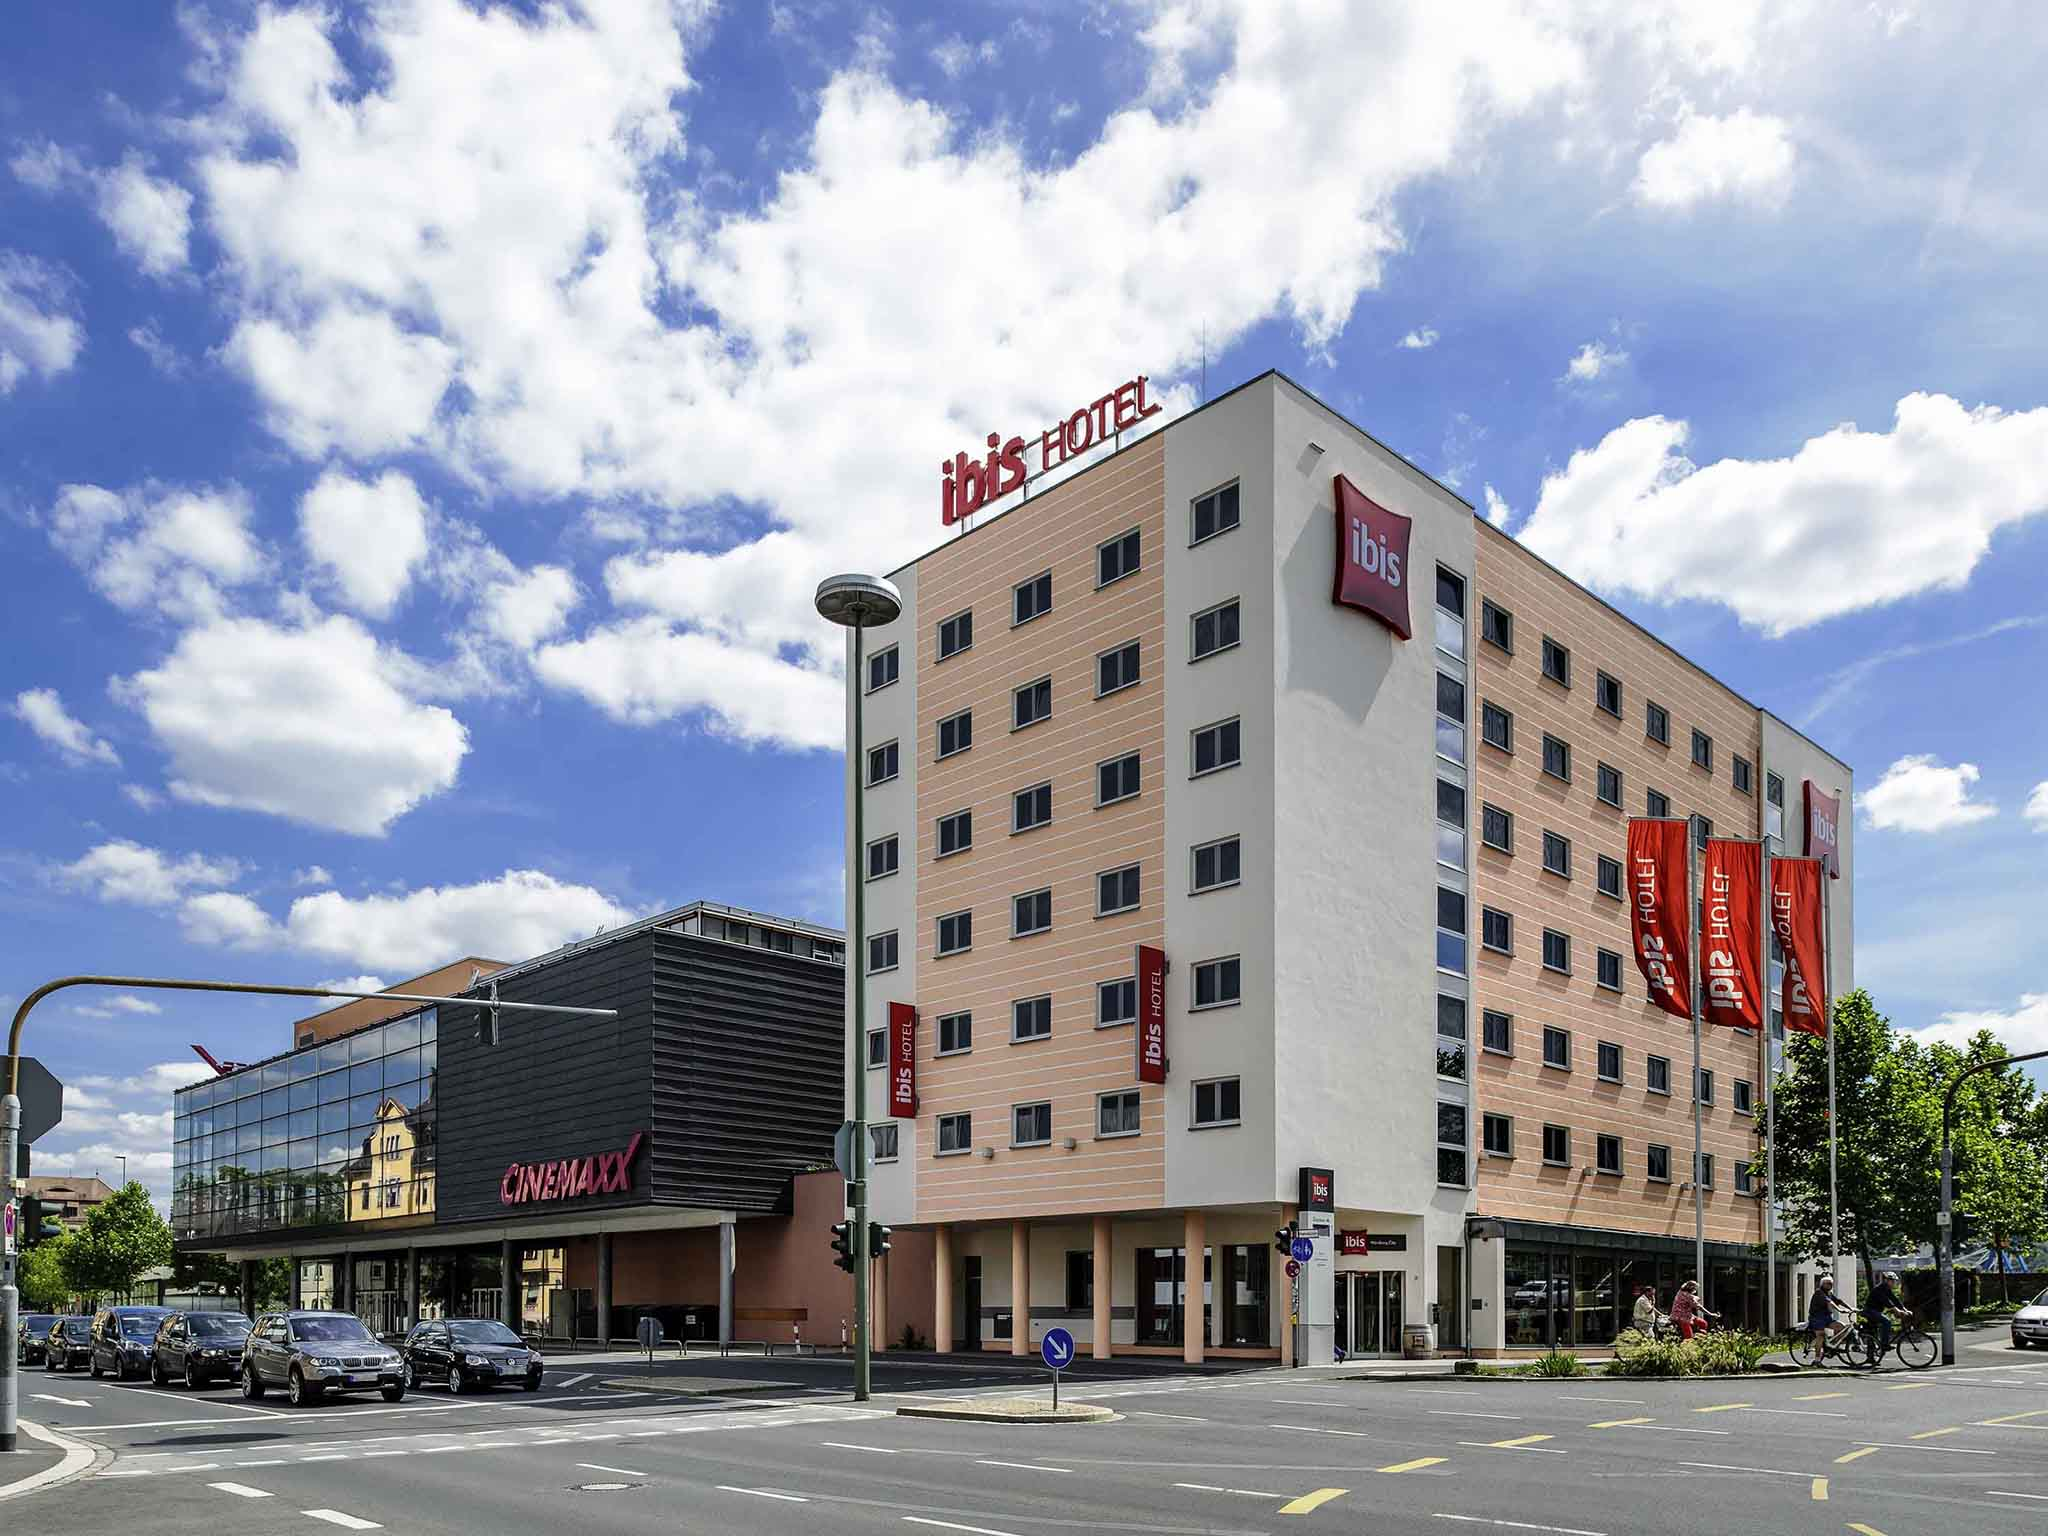 Augsburg Ibis Hotel Hauptbahnhof